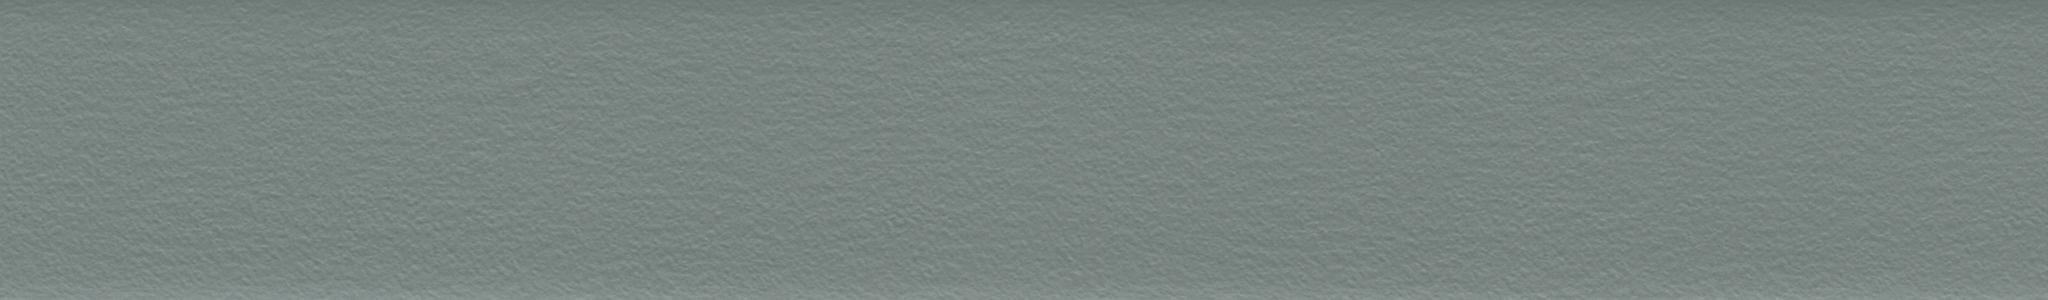 HU 177912 ABS Edge Grey Soft Pearl 107